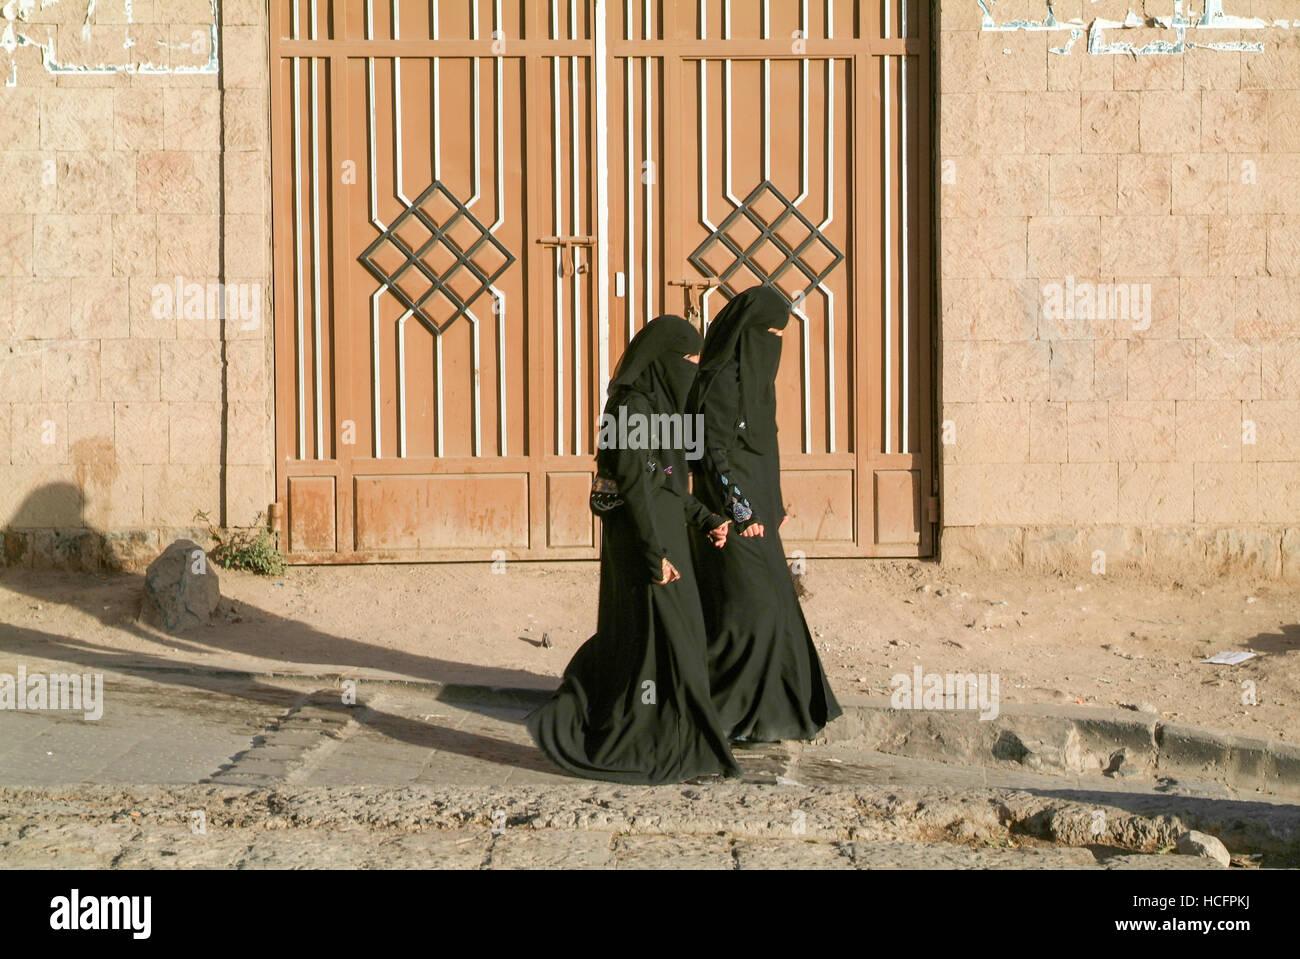 Sana, Yemen - 3 January 2008: women wearing the burqa and walking on the street of old Sana, Yemen - Stock Image